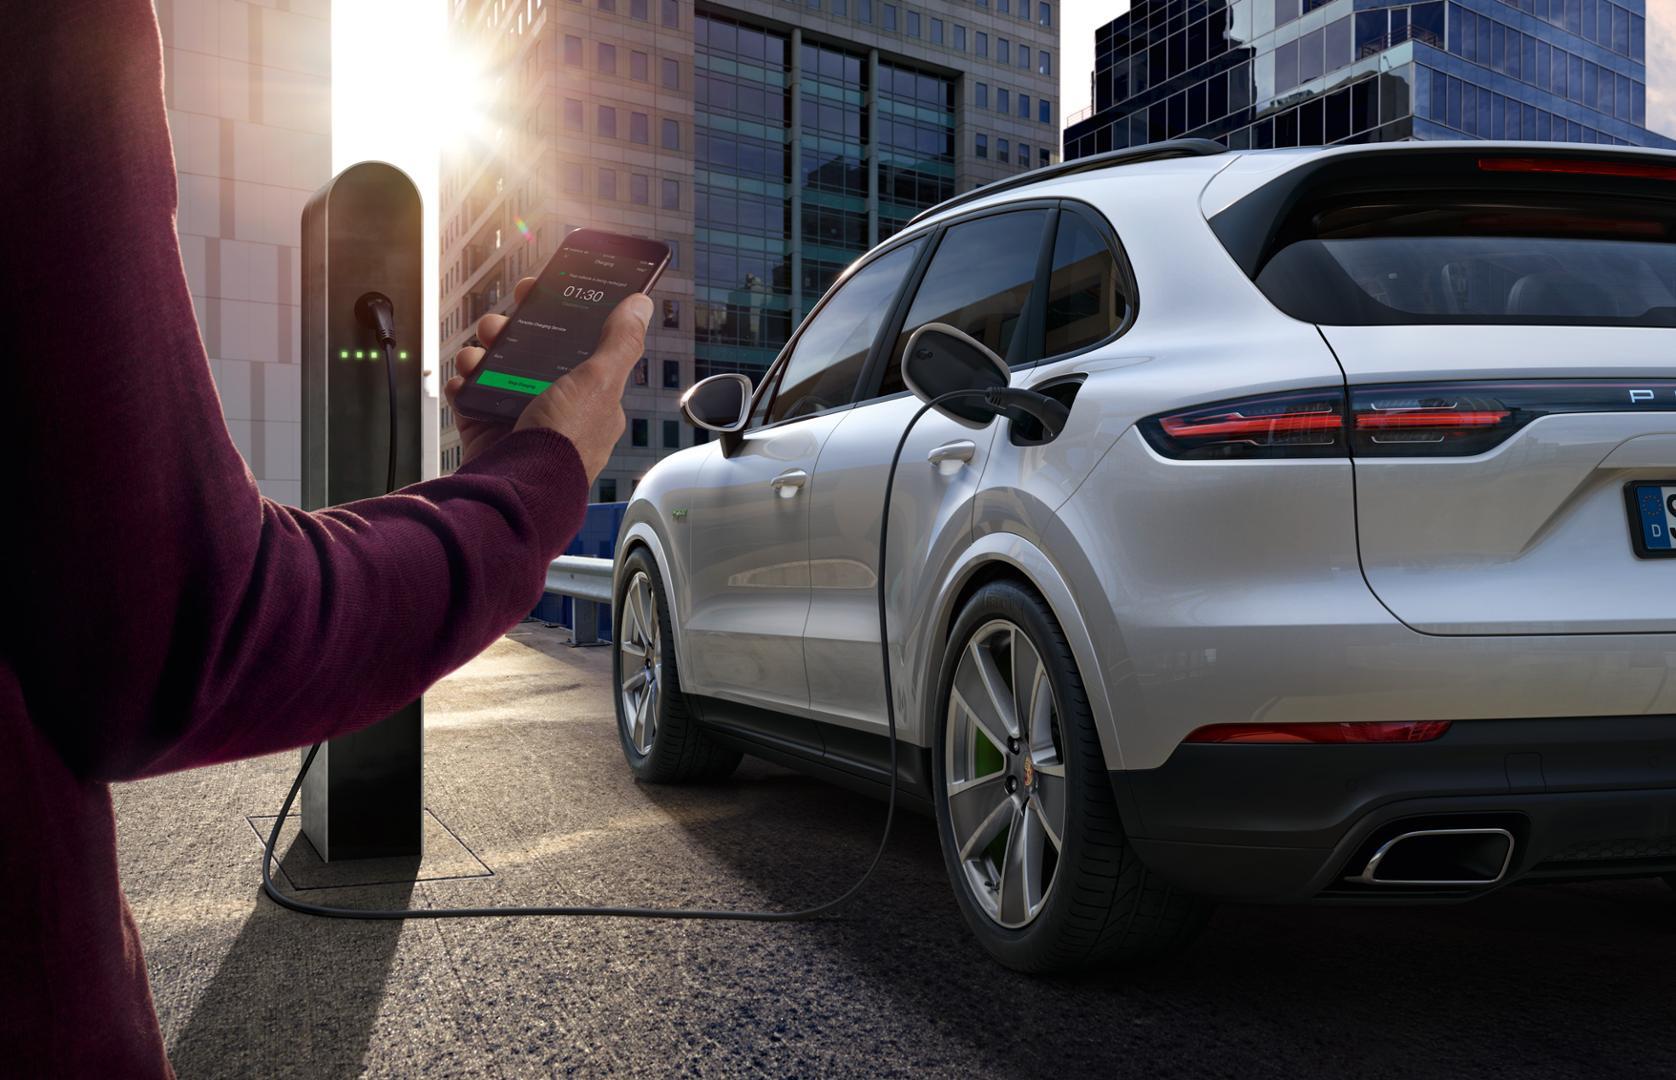 Porsche Charging